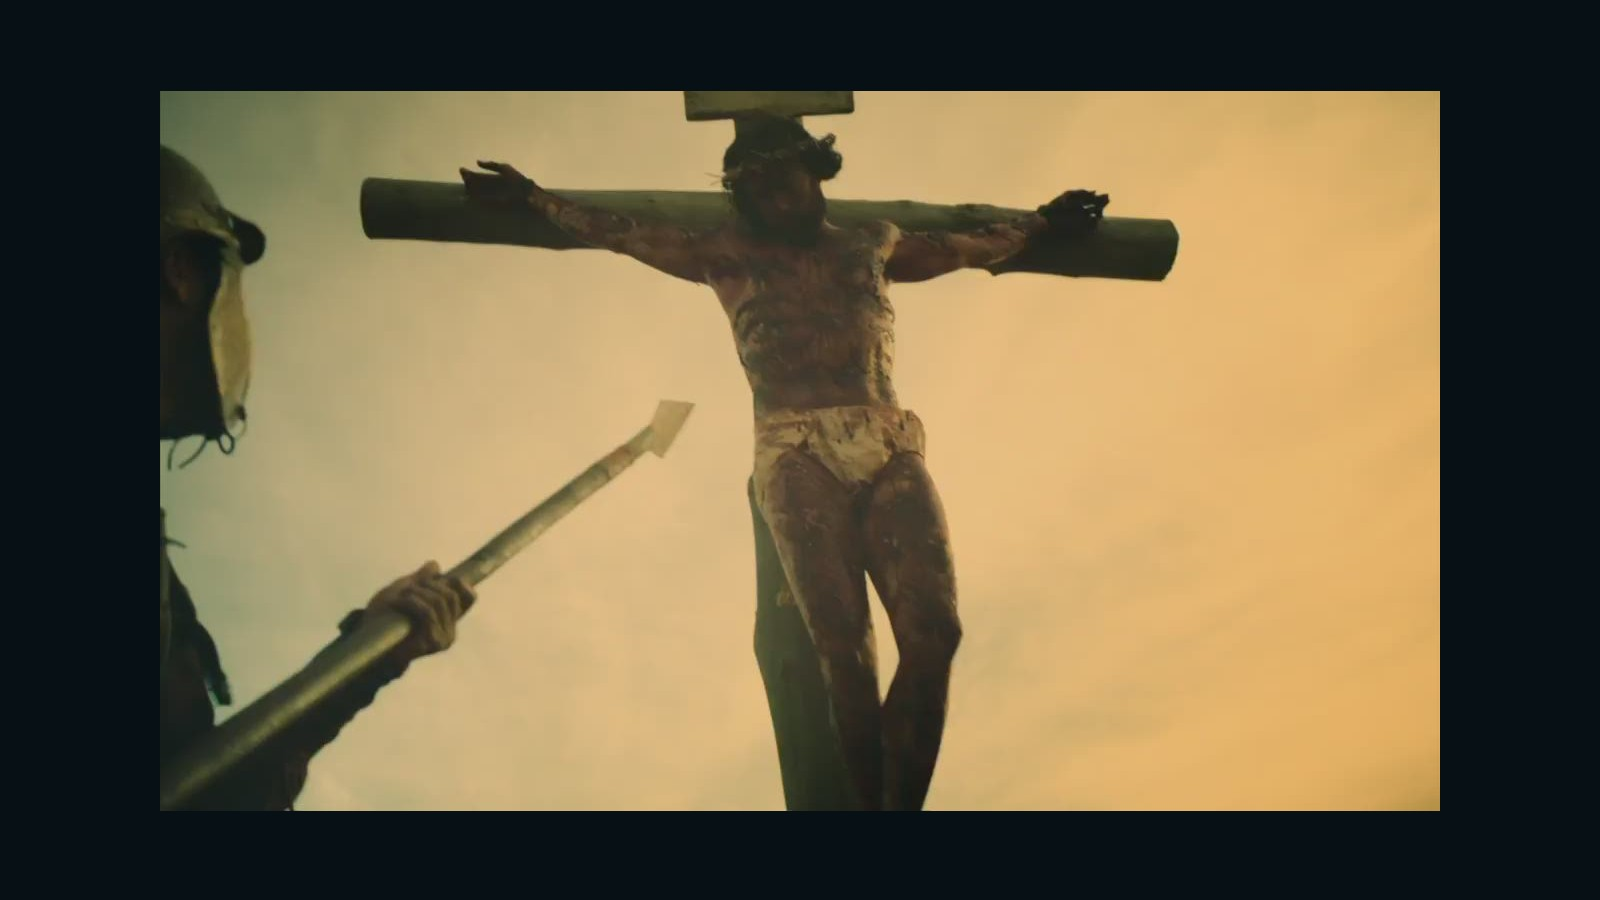 finding jesus u0027 jesus u0027 cross q u0026a cnn